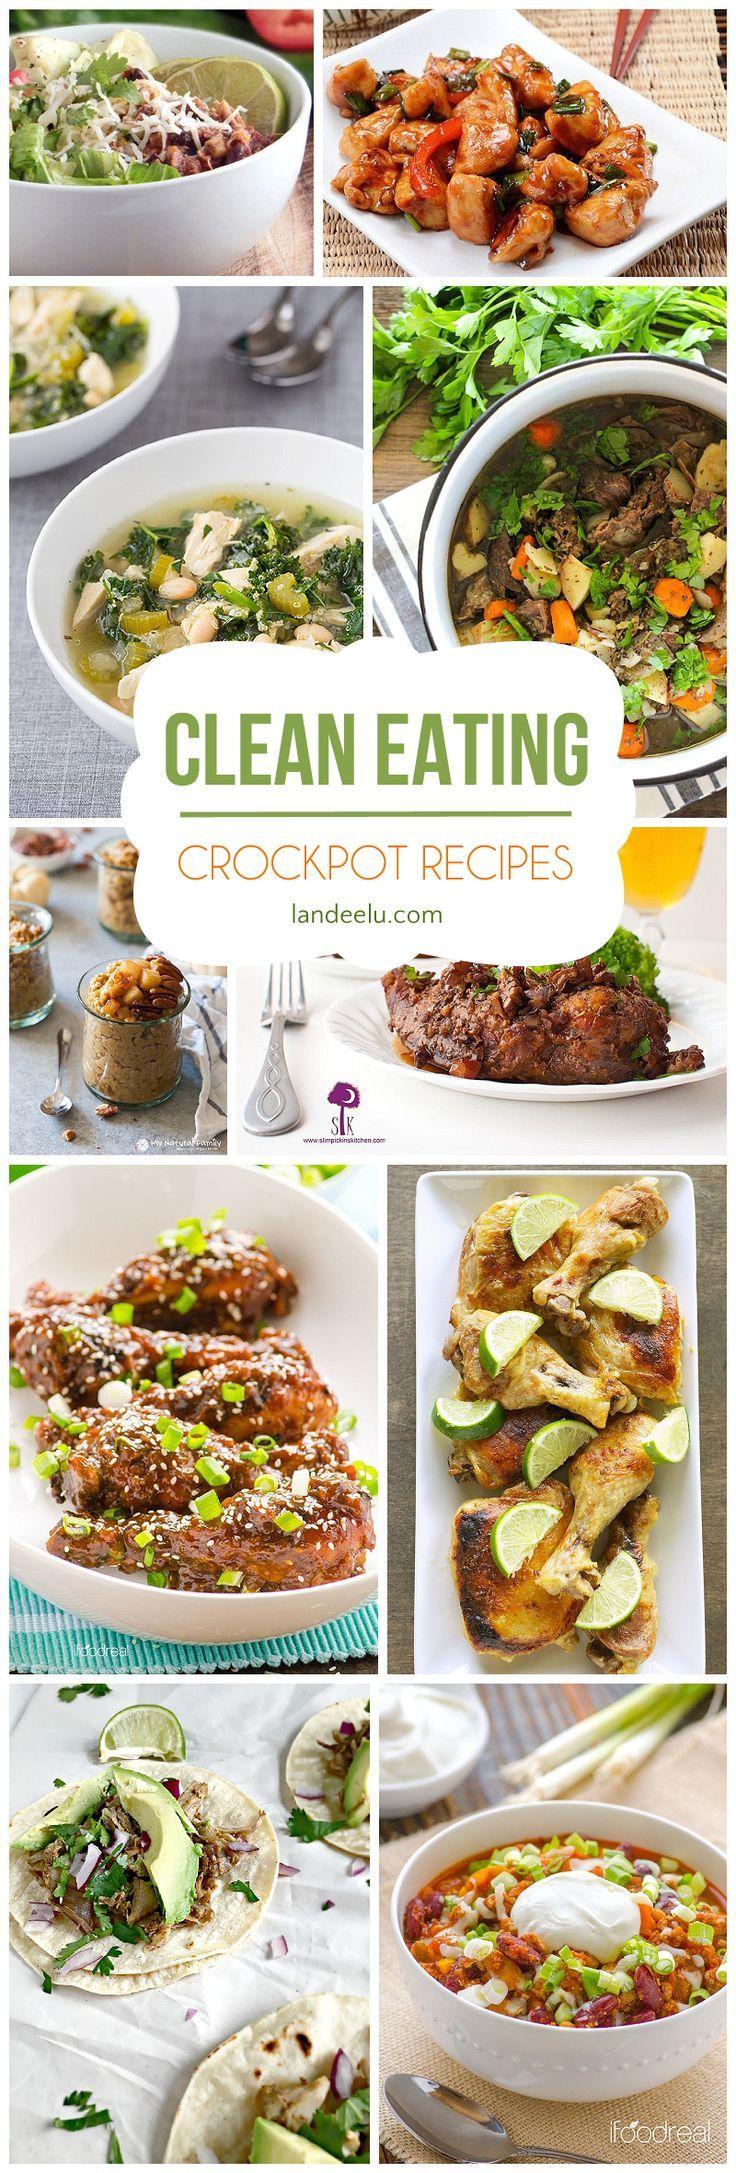 Clean Eating Crockpot Recipes